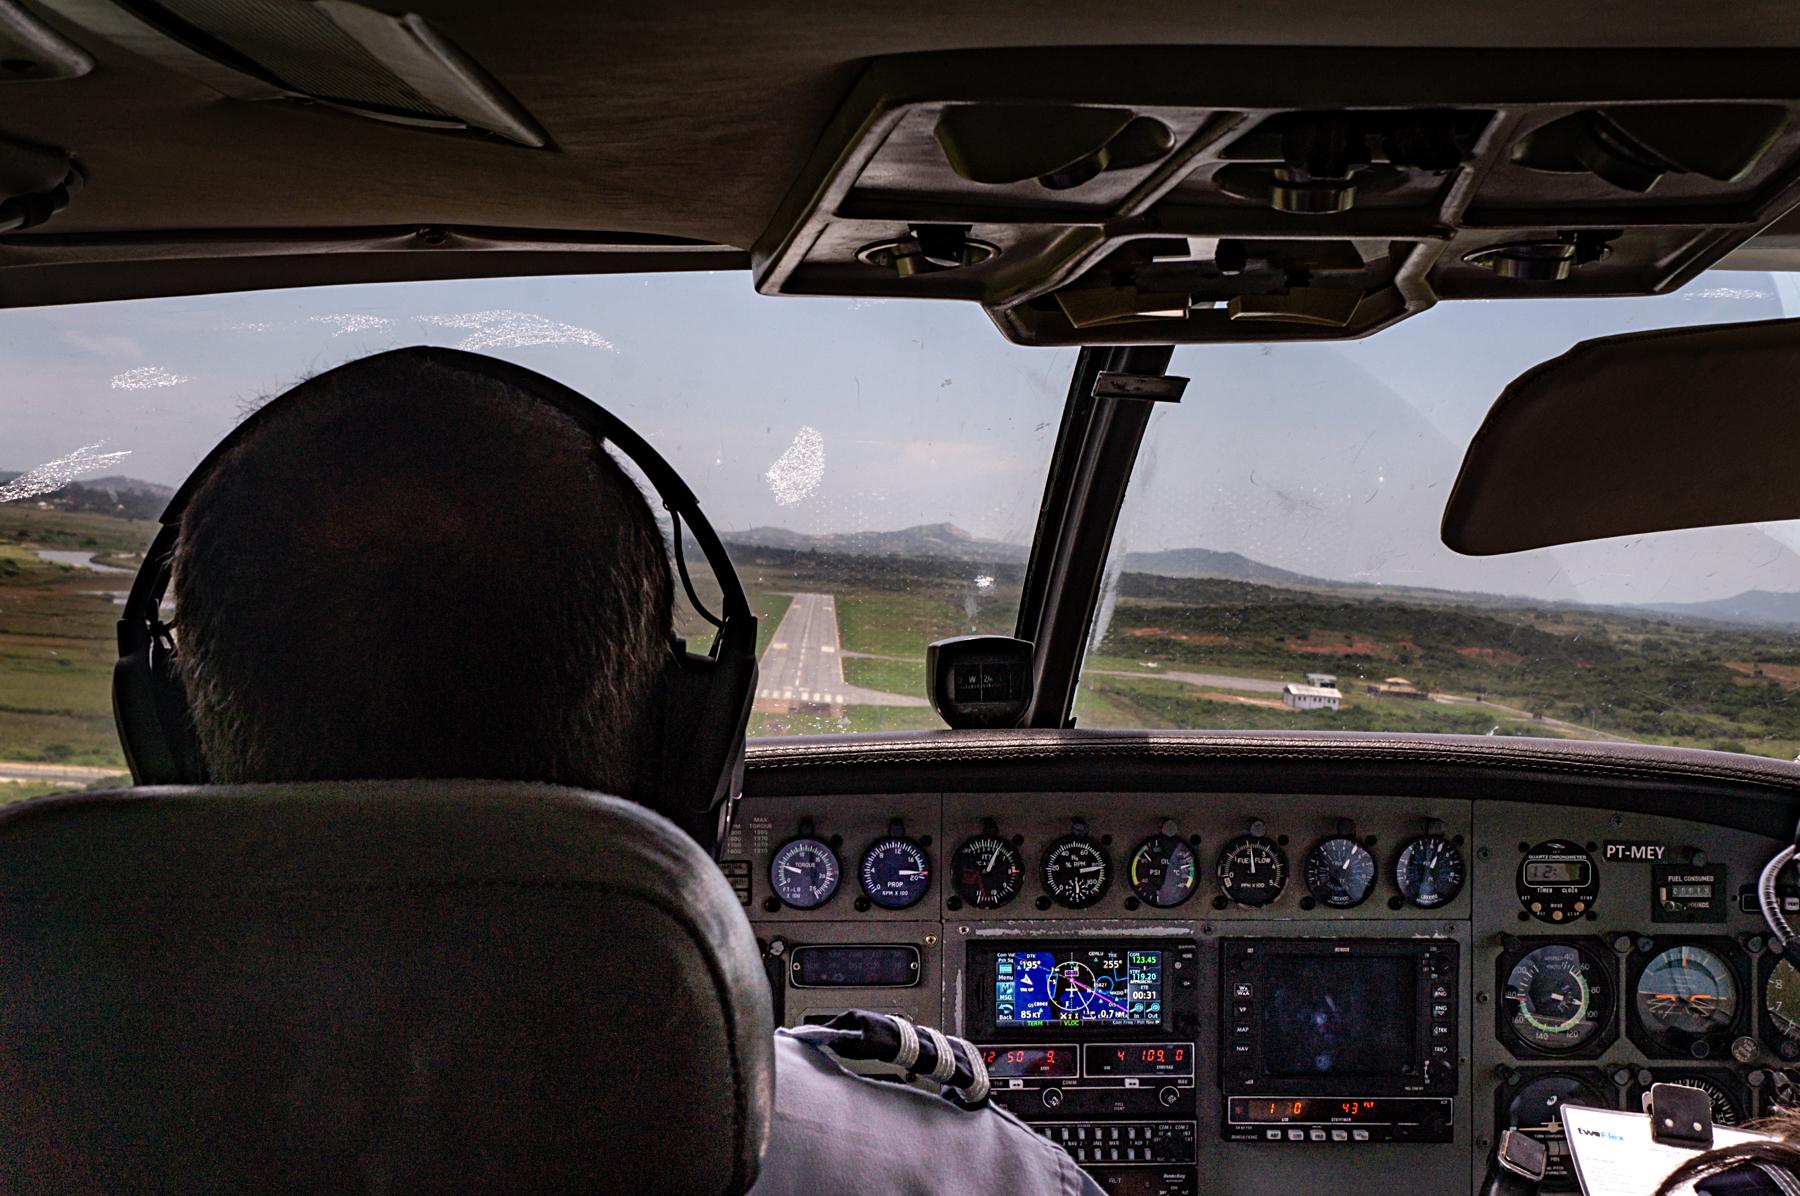 Aproximação final aeroporto de Búzios Cessna Caravan Azul